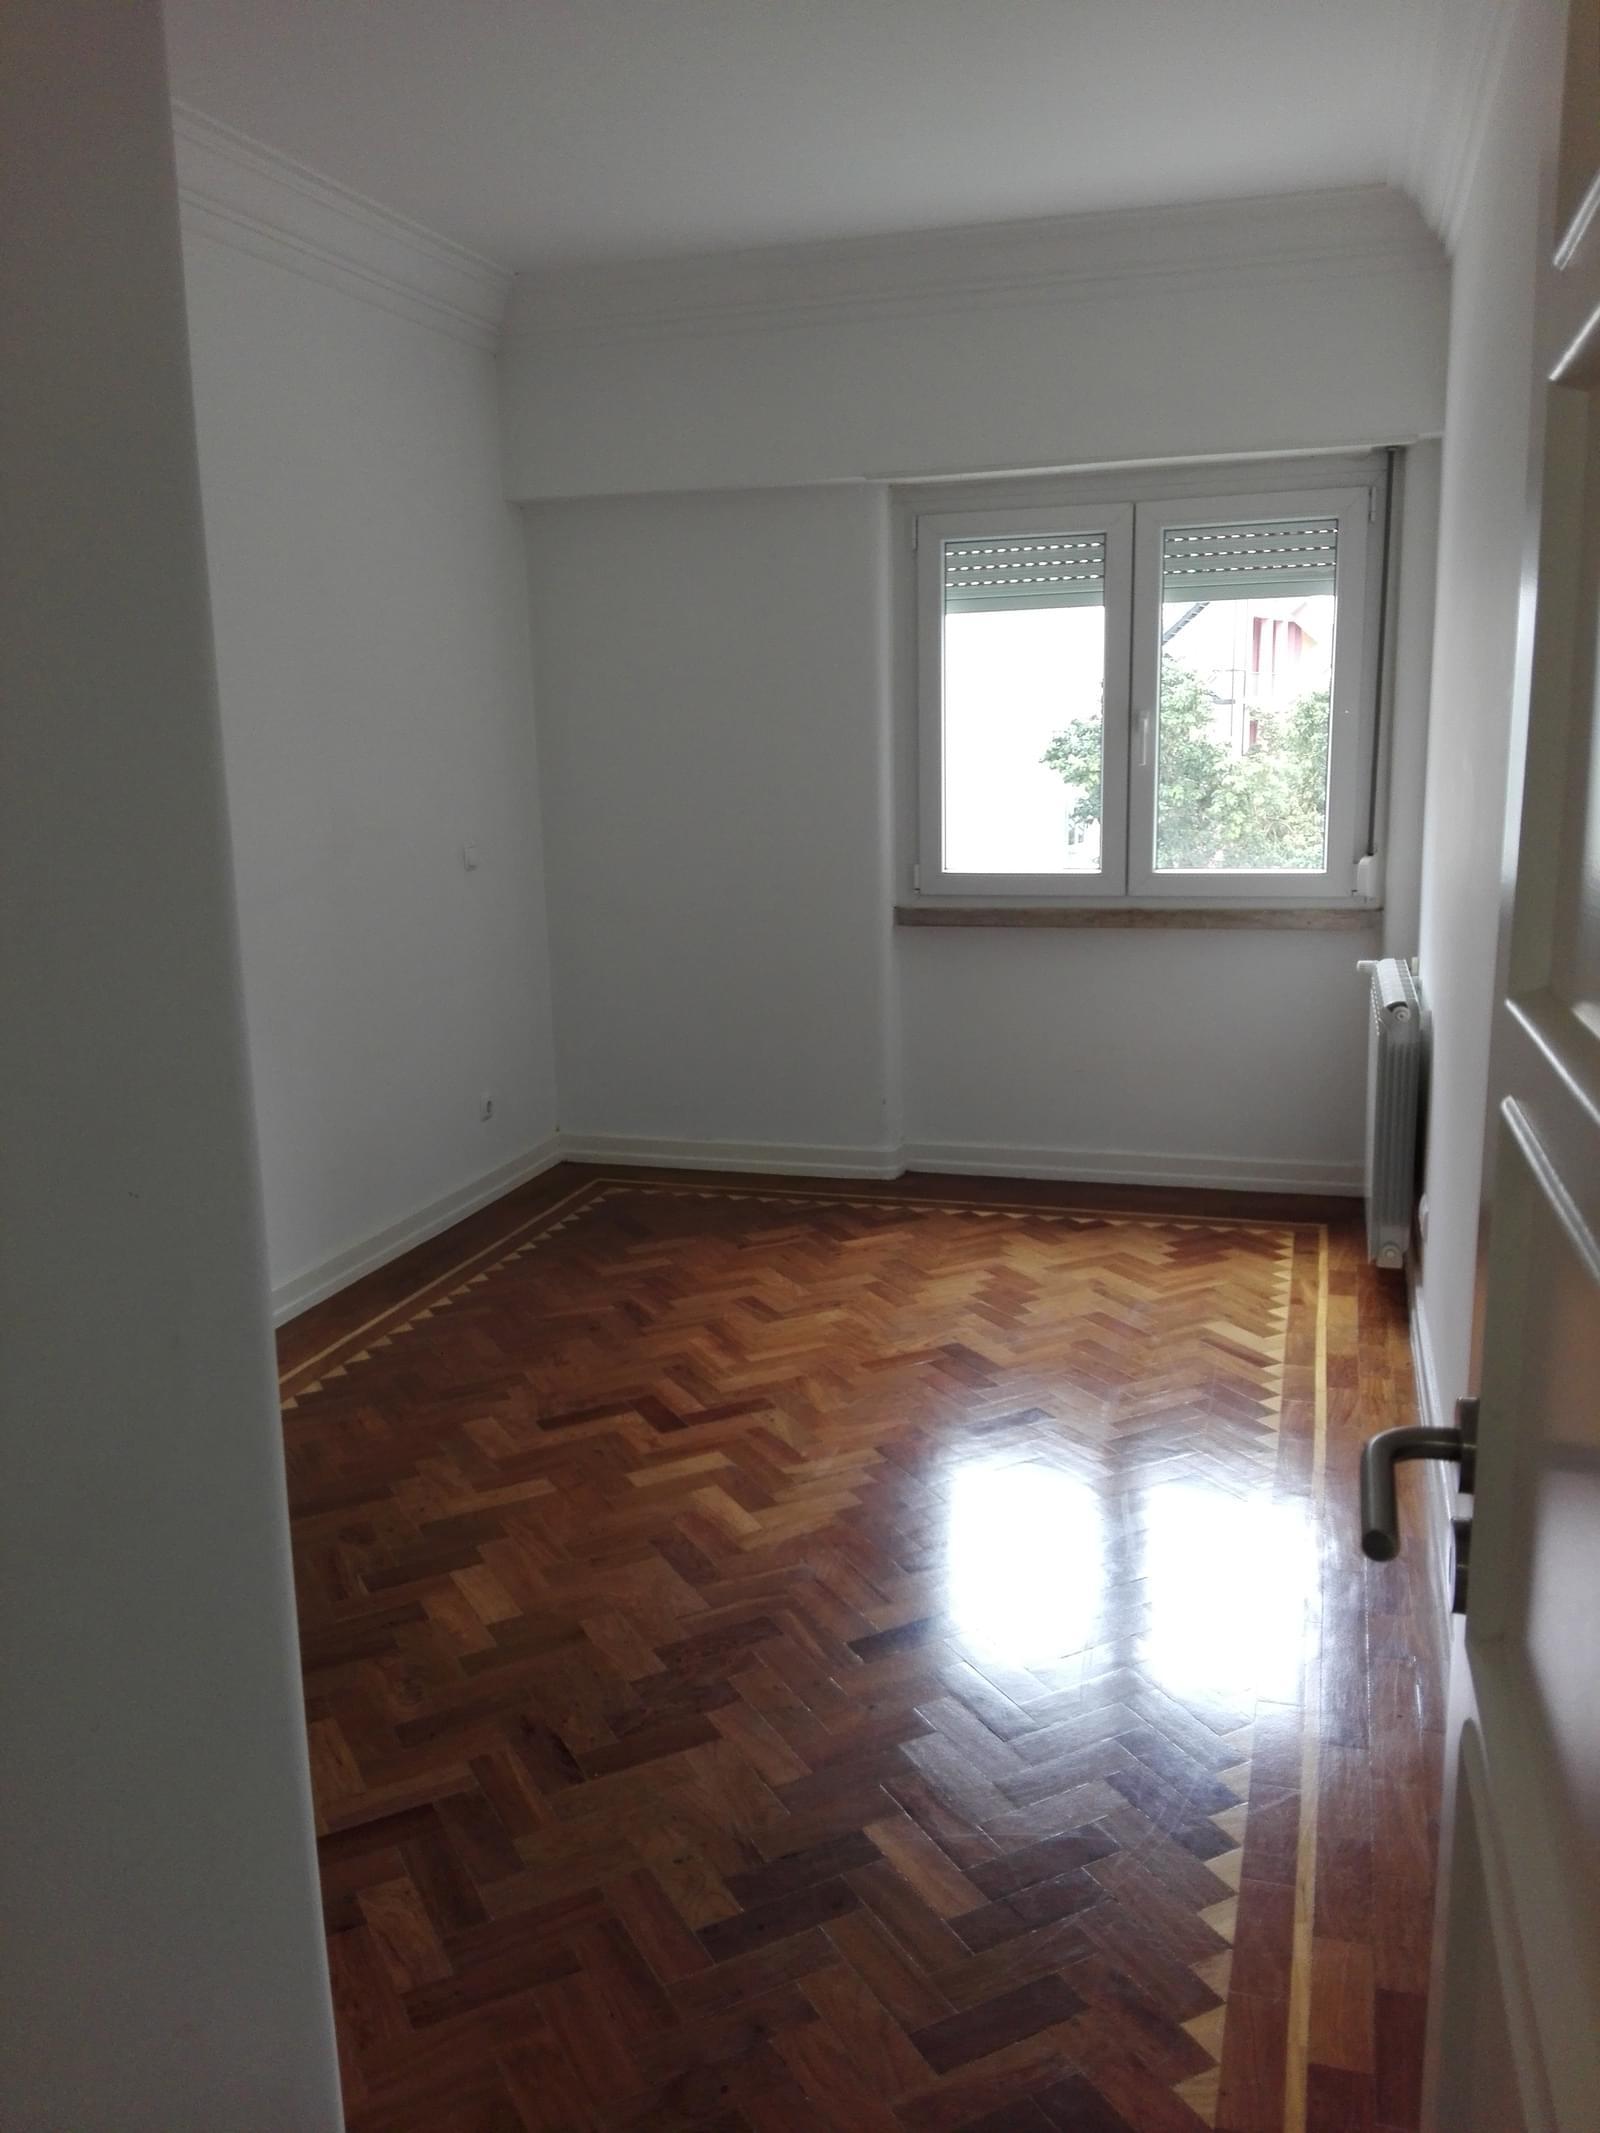 pf17056-apartamento-t4-1-lisboa-15e4fecc-305b-49cc-a2ae-a50322a750de